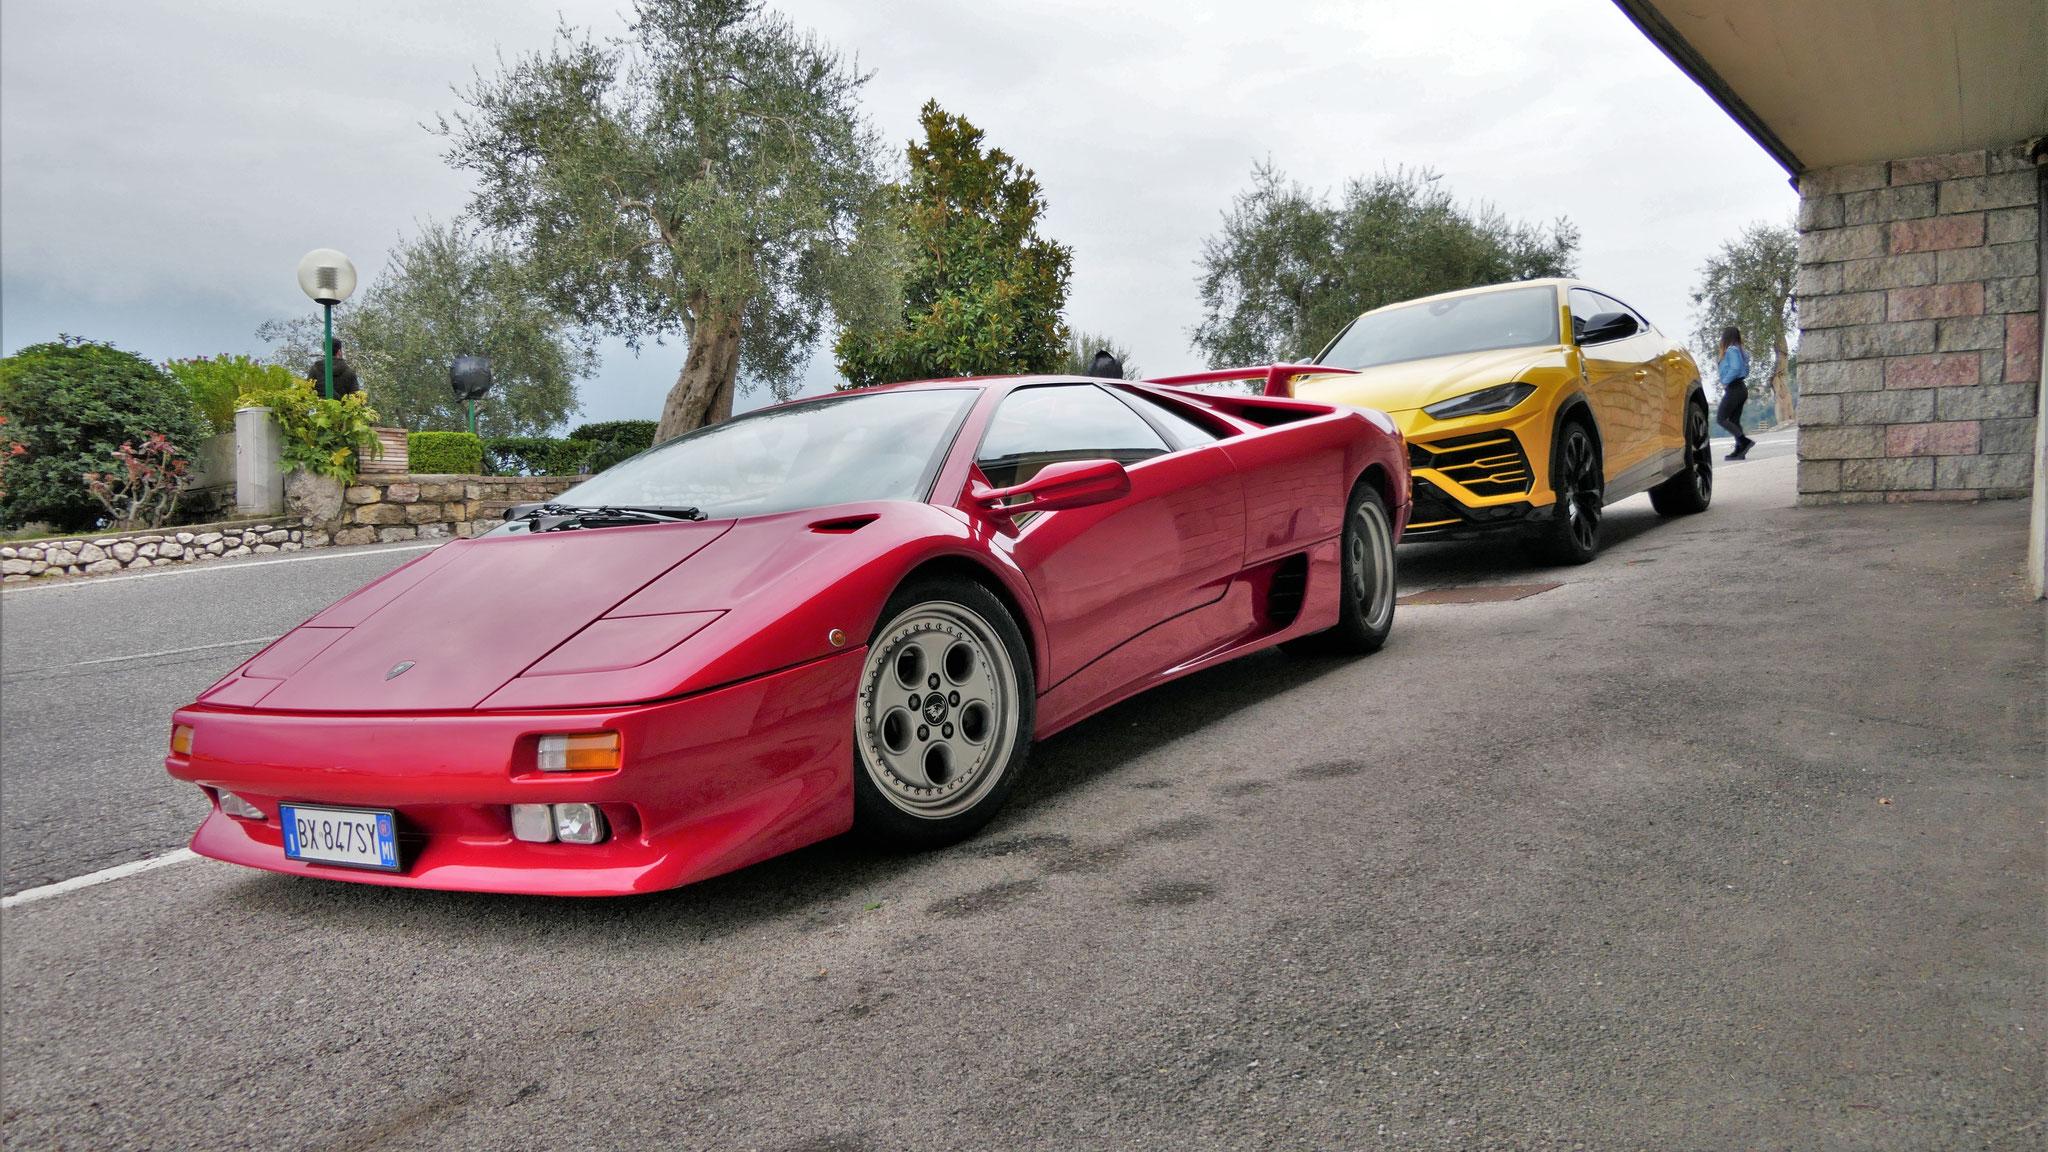 Lamborghini Diablo VT - BX-847-SY (ITA)